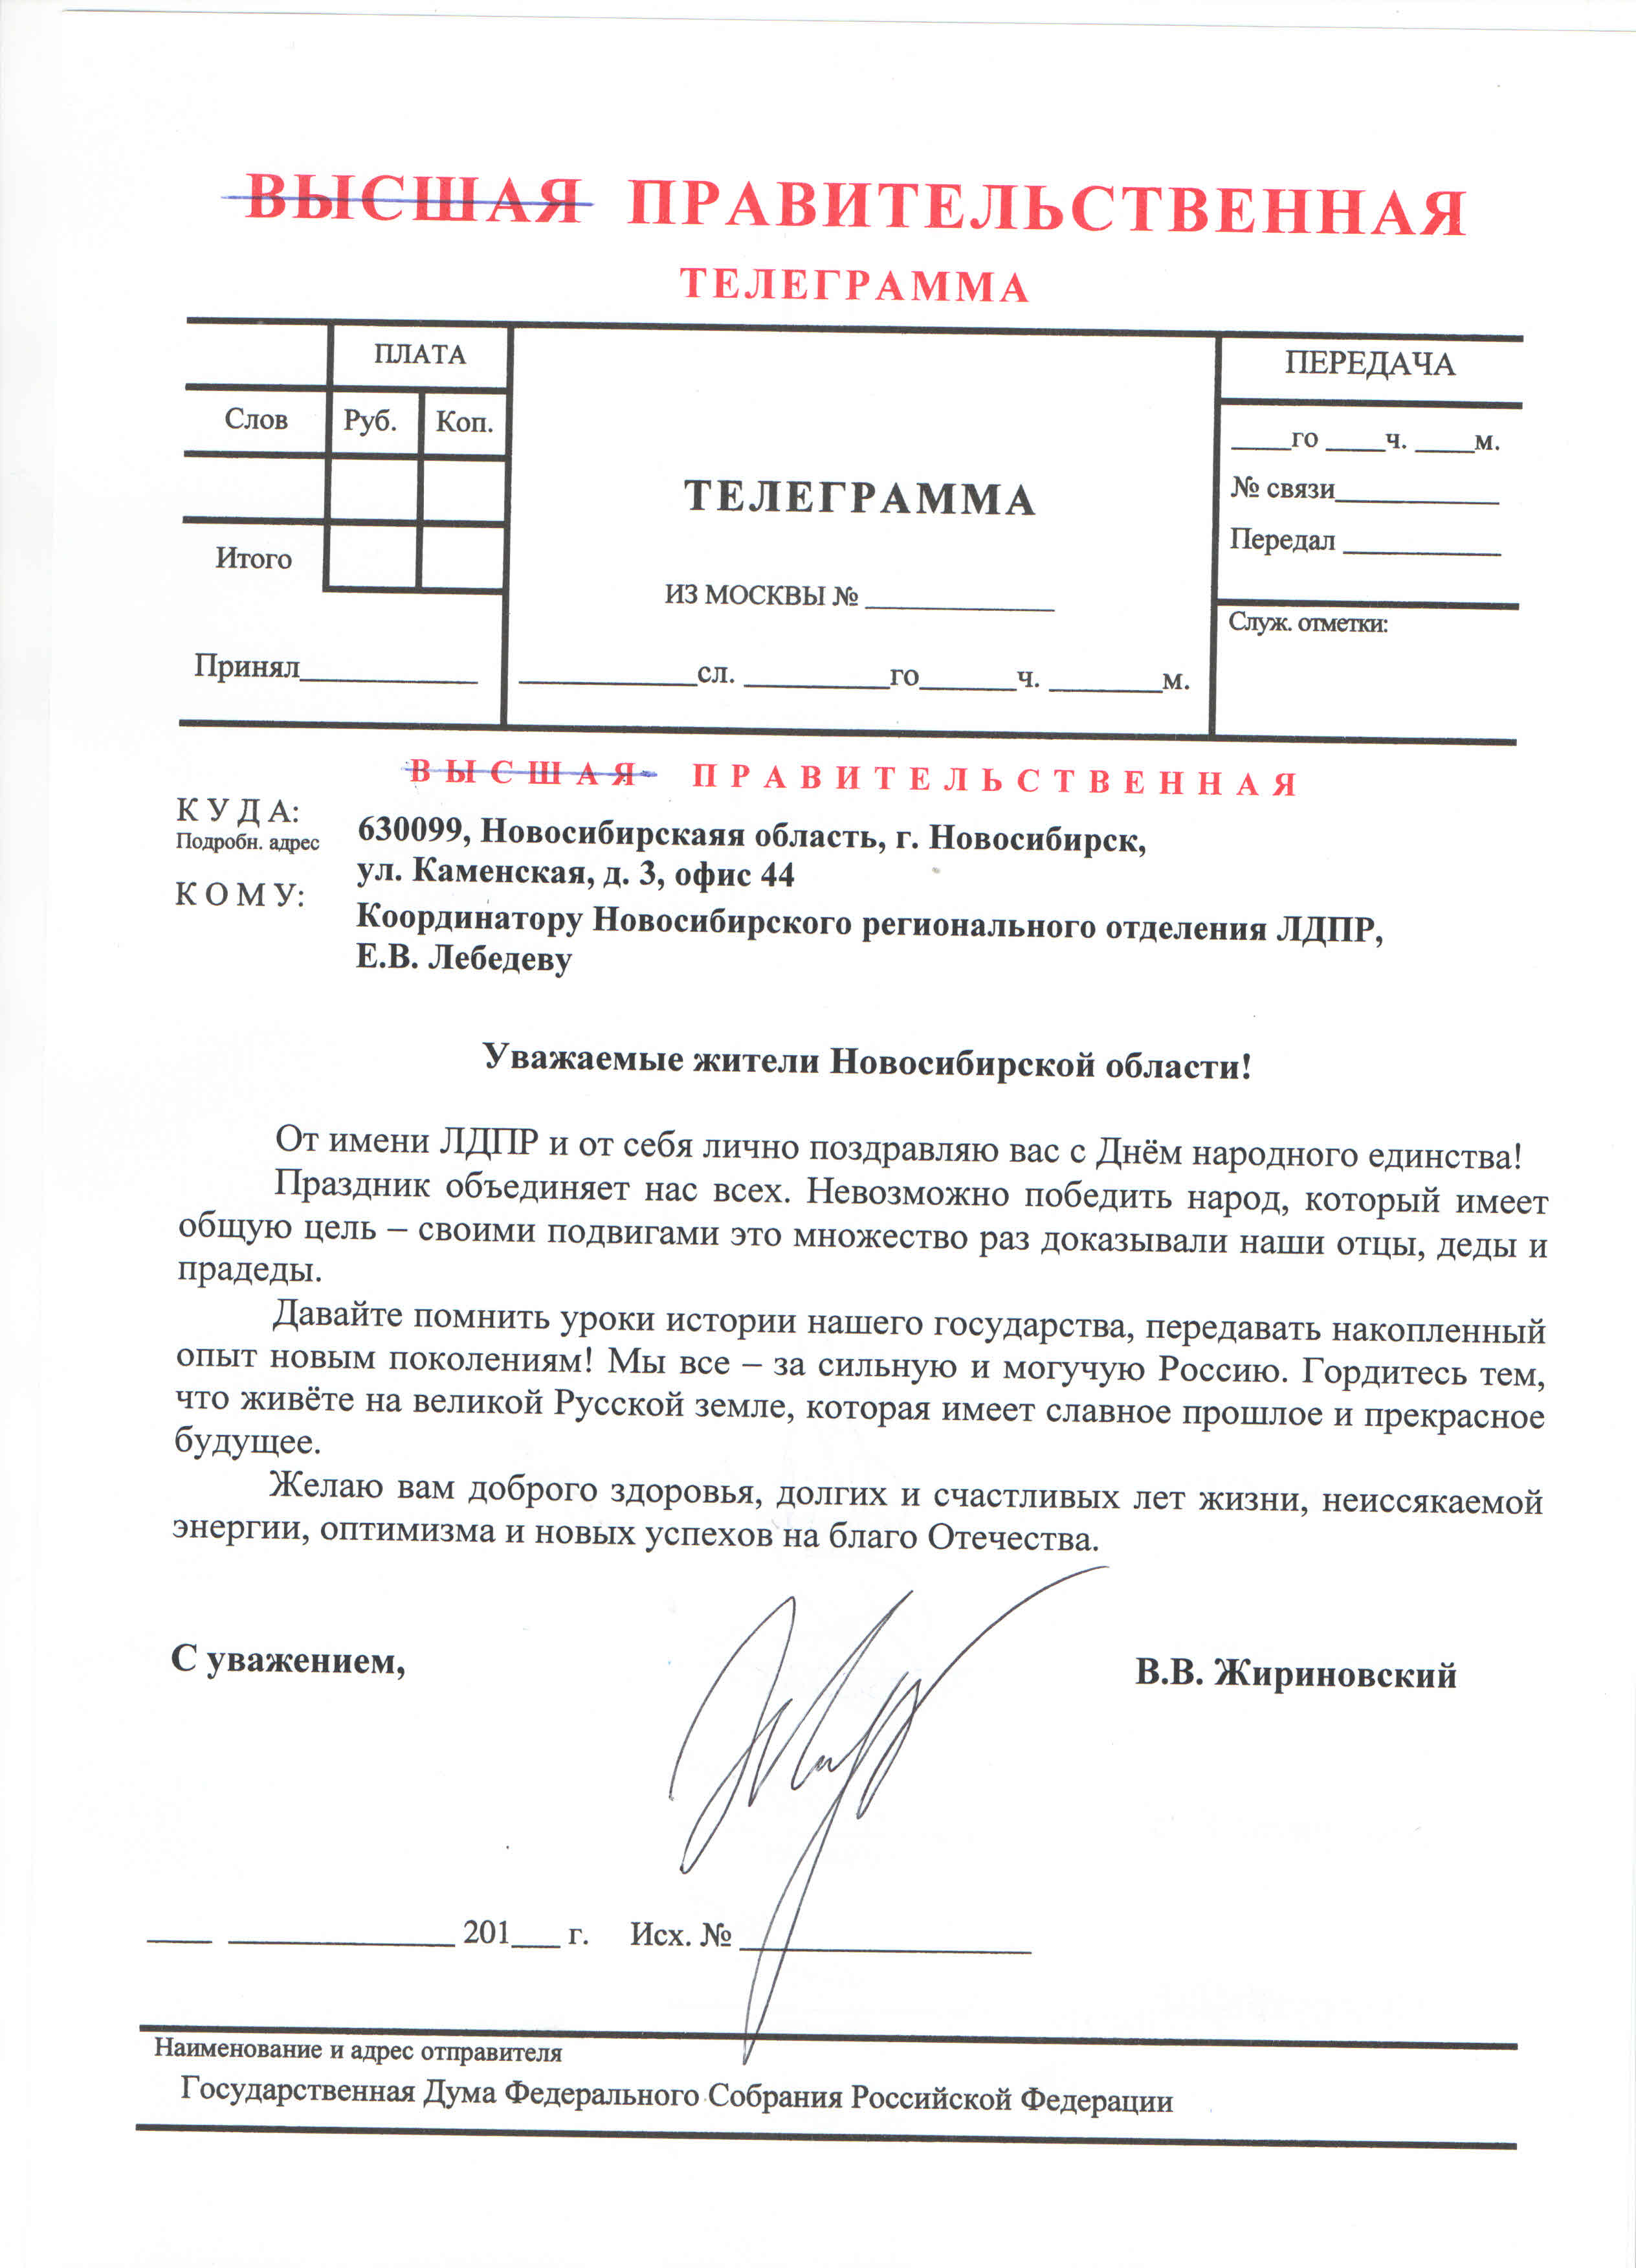 Телеграмма от В. В. Жириновского жителям Новосибирска